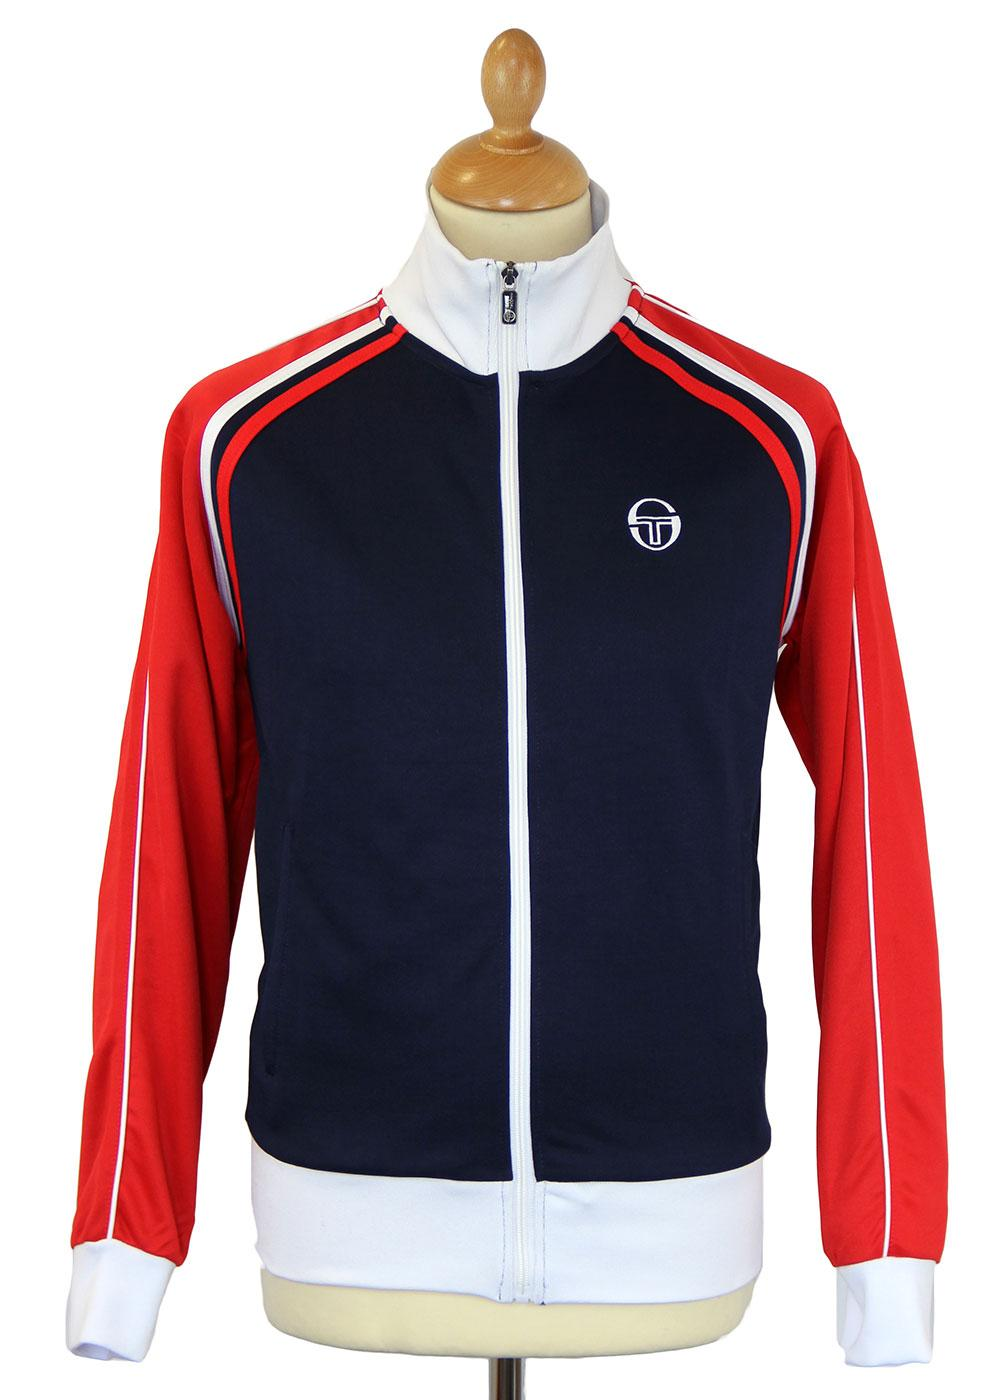 106ef79f6 Ghibli SERGIO TACCHINI Retro 80s Track Jacket